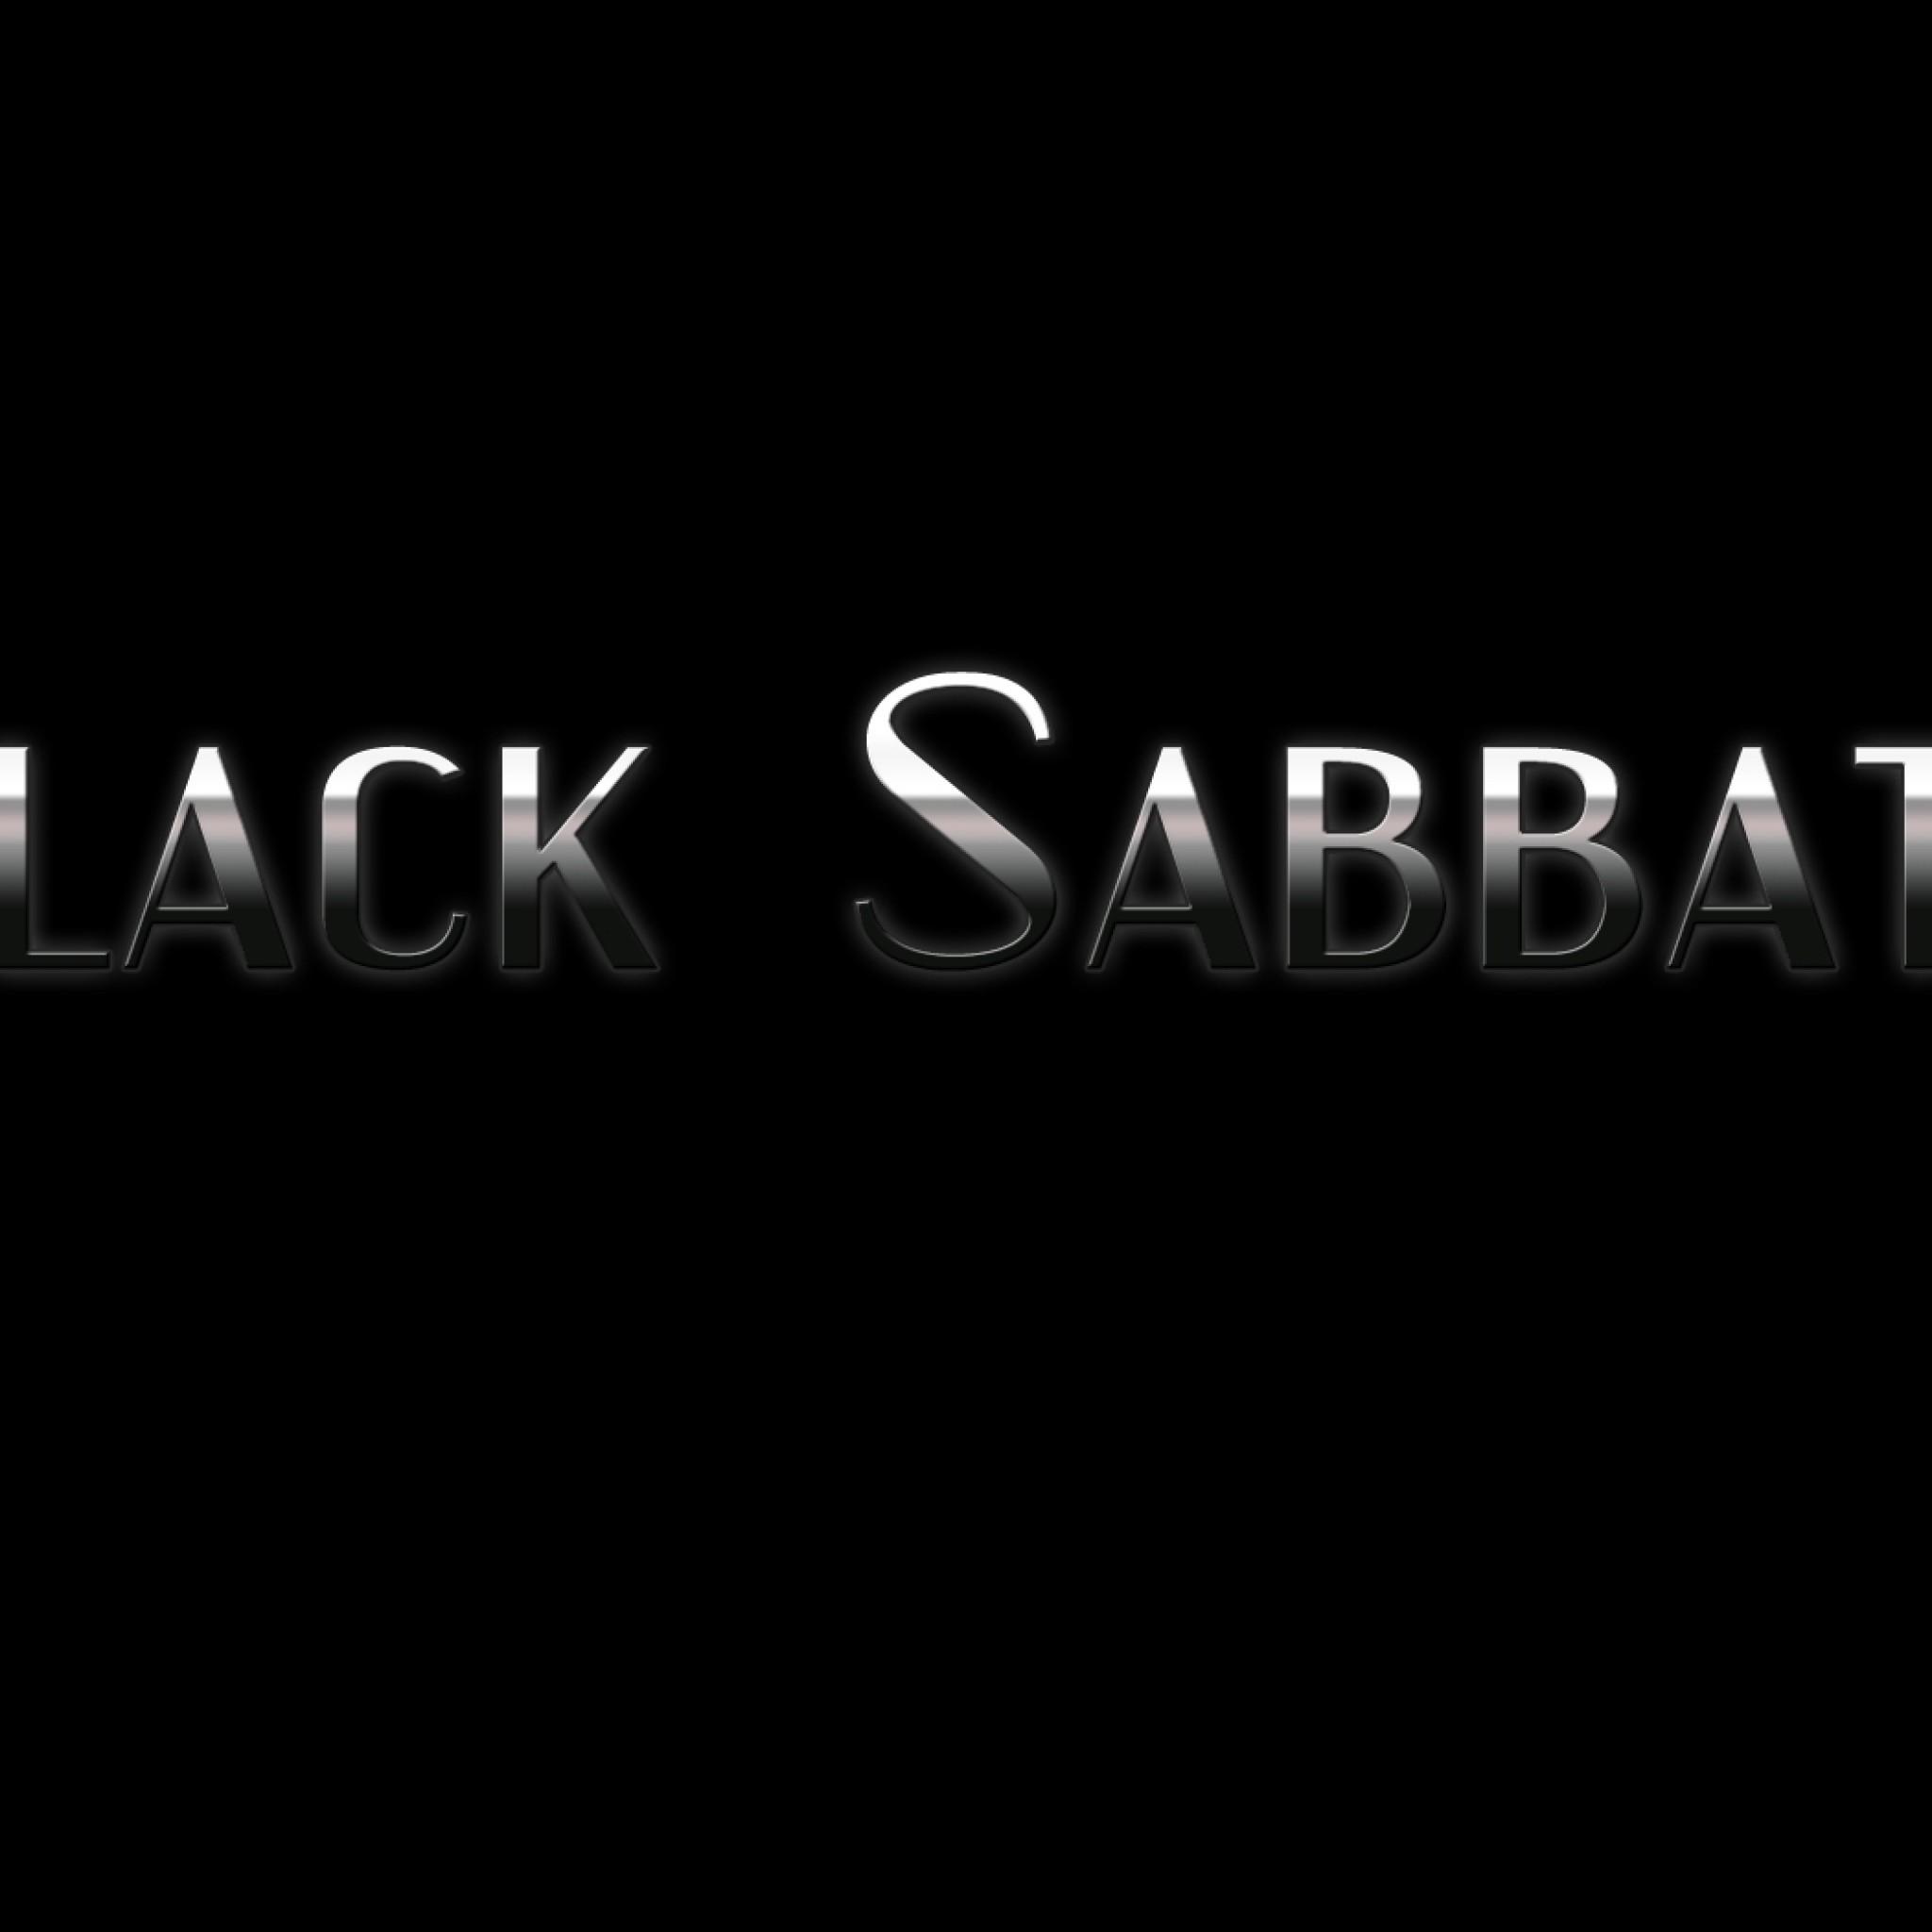 Wallpaper black sabbath, font, background, name, light